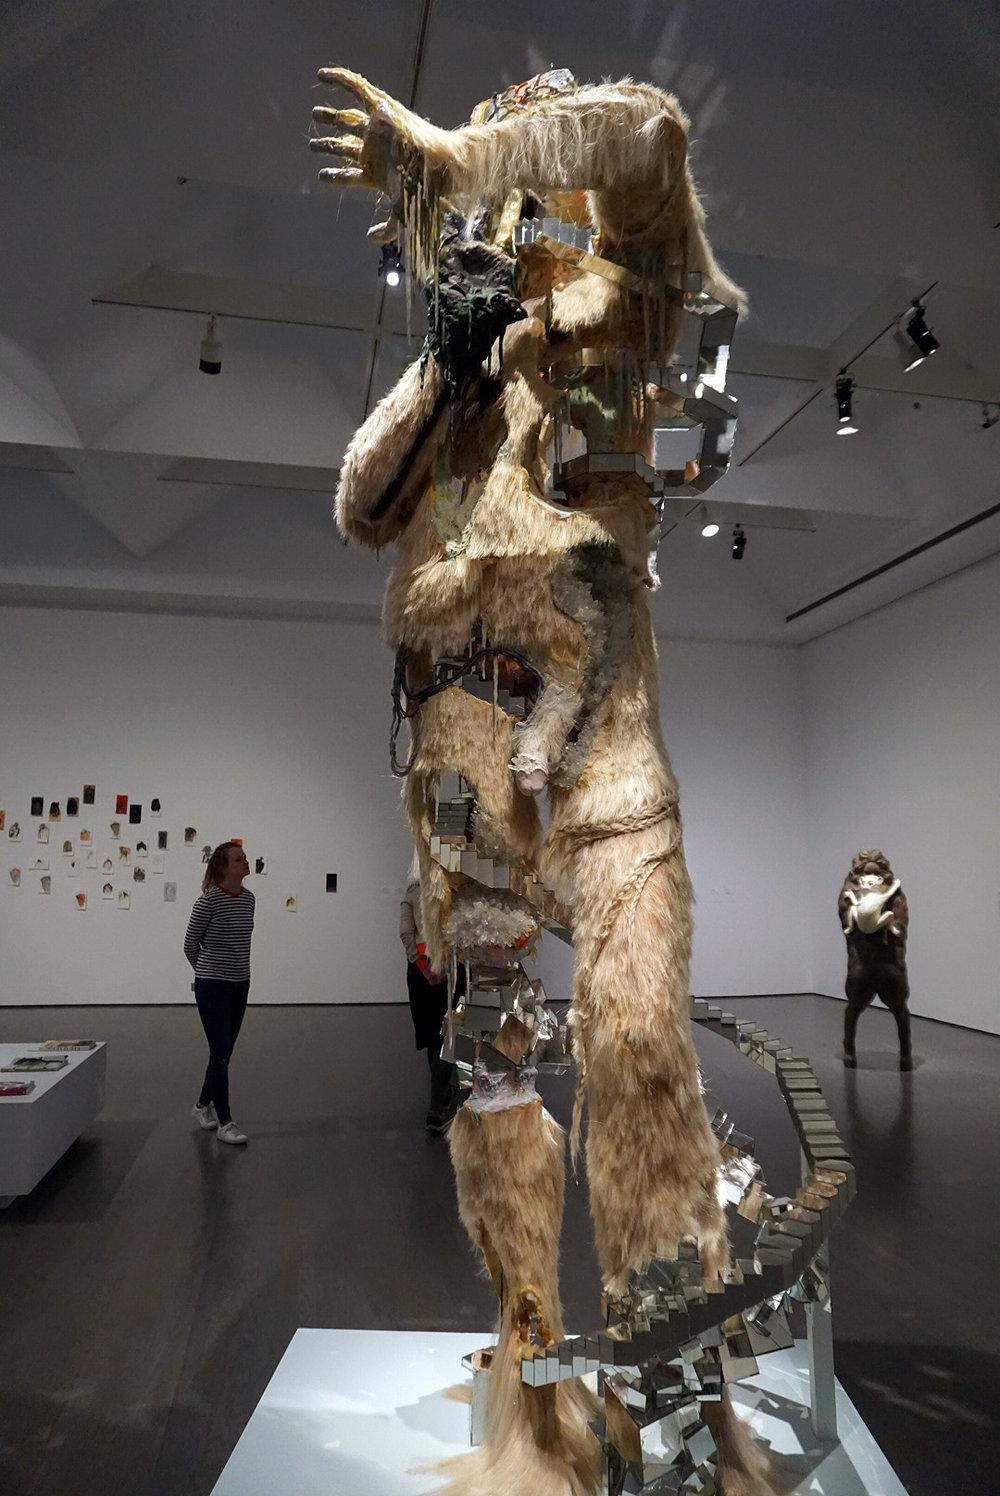 Musée-d'art-contemporain-de-Montréal-Canada-Traveller-Travel-Blogger-LINDATENCHITRAN-5-1616x1080.jpg